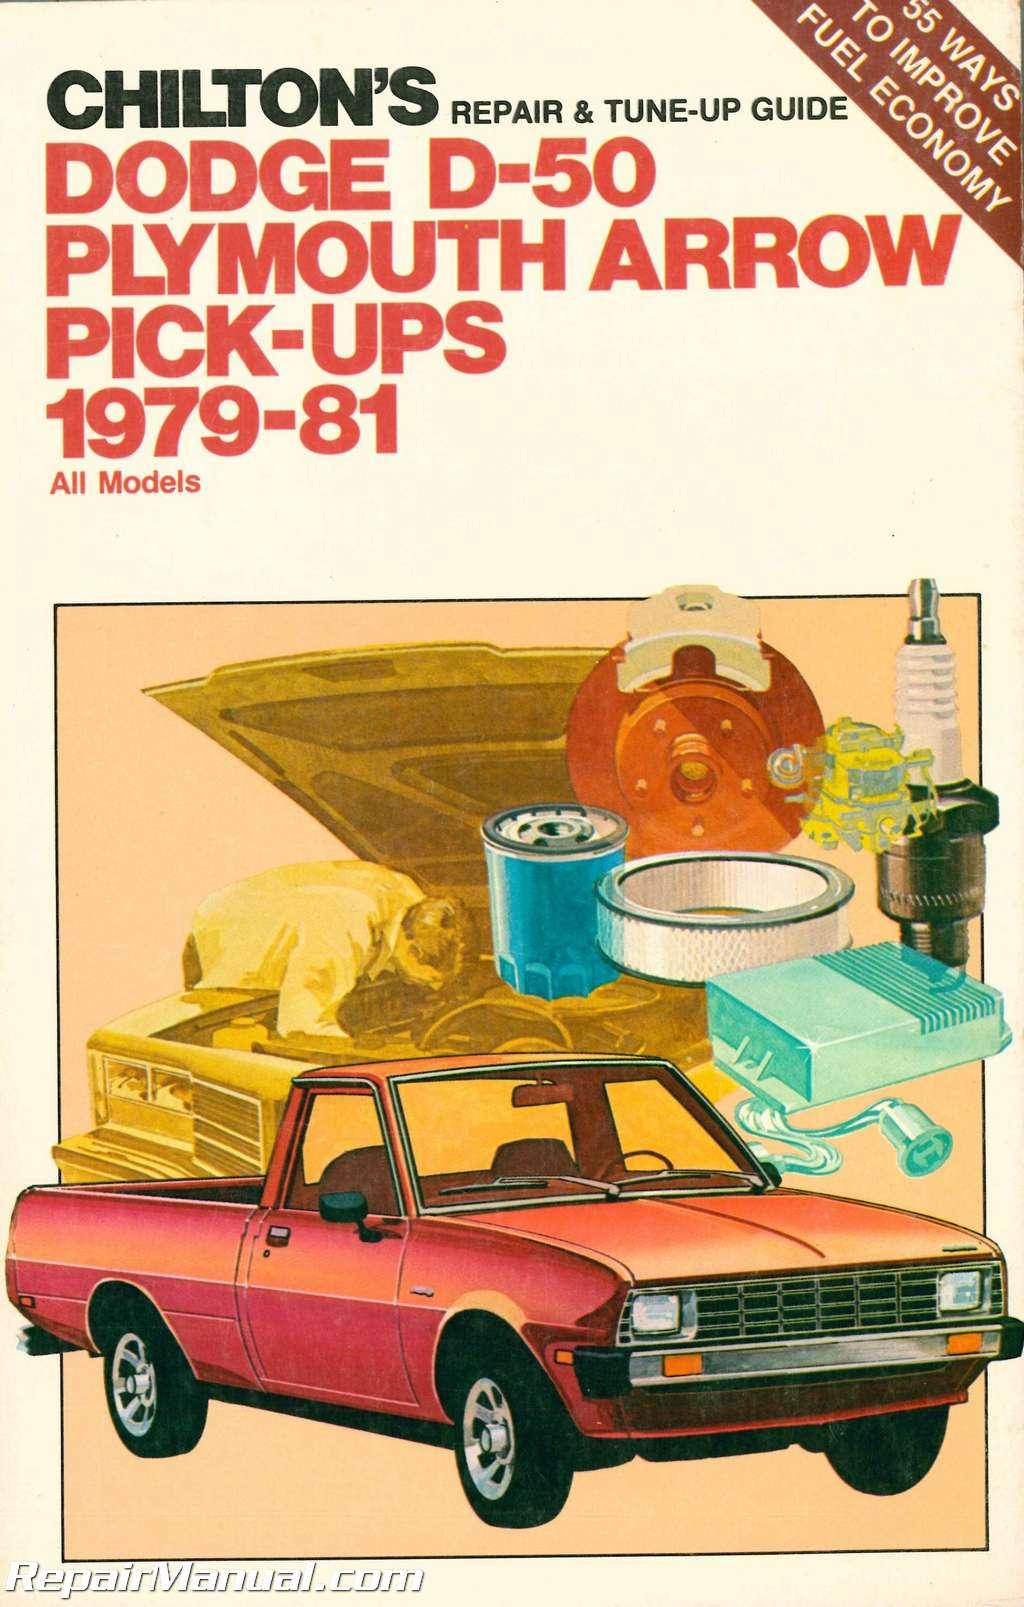 ... Repair Manual. Sale! chilton-1979-1981-dodge-d-50-plymouth-arrow-